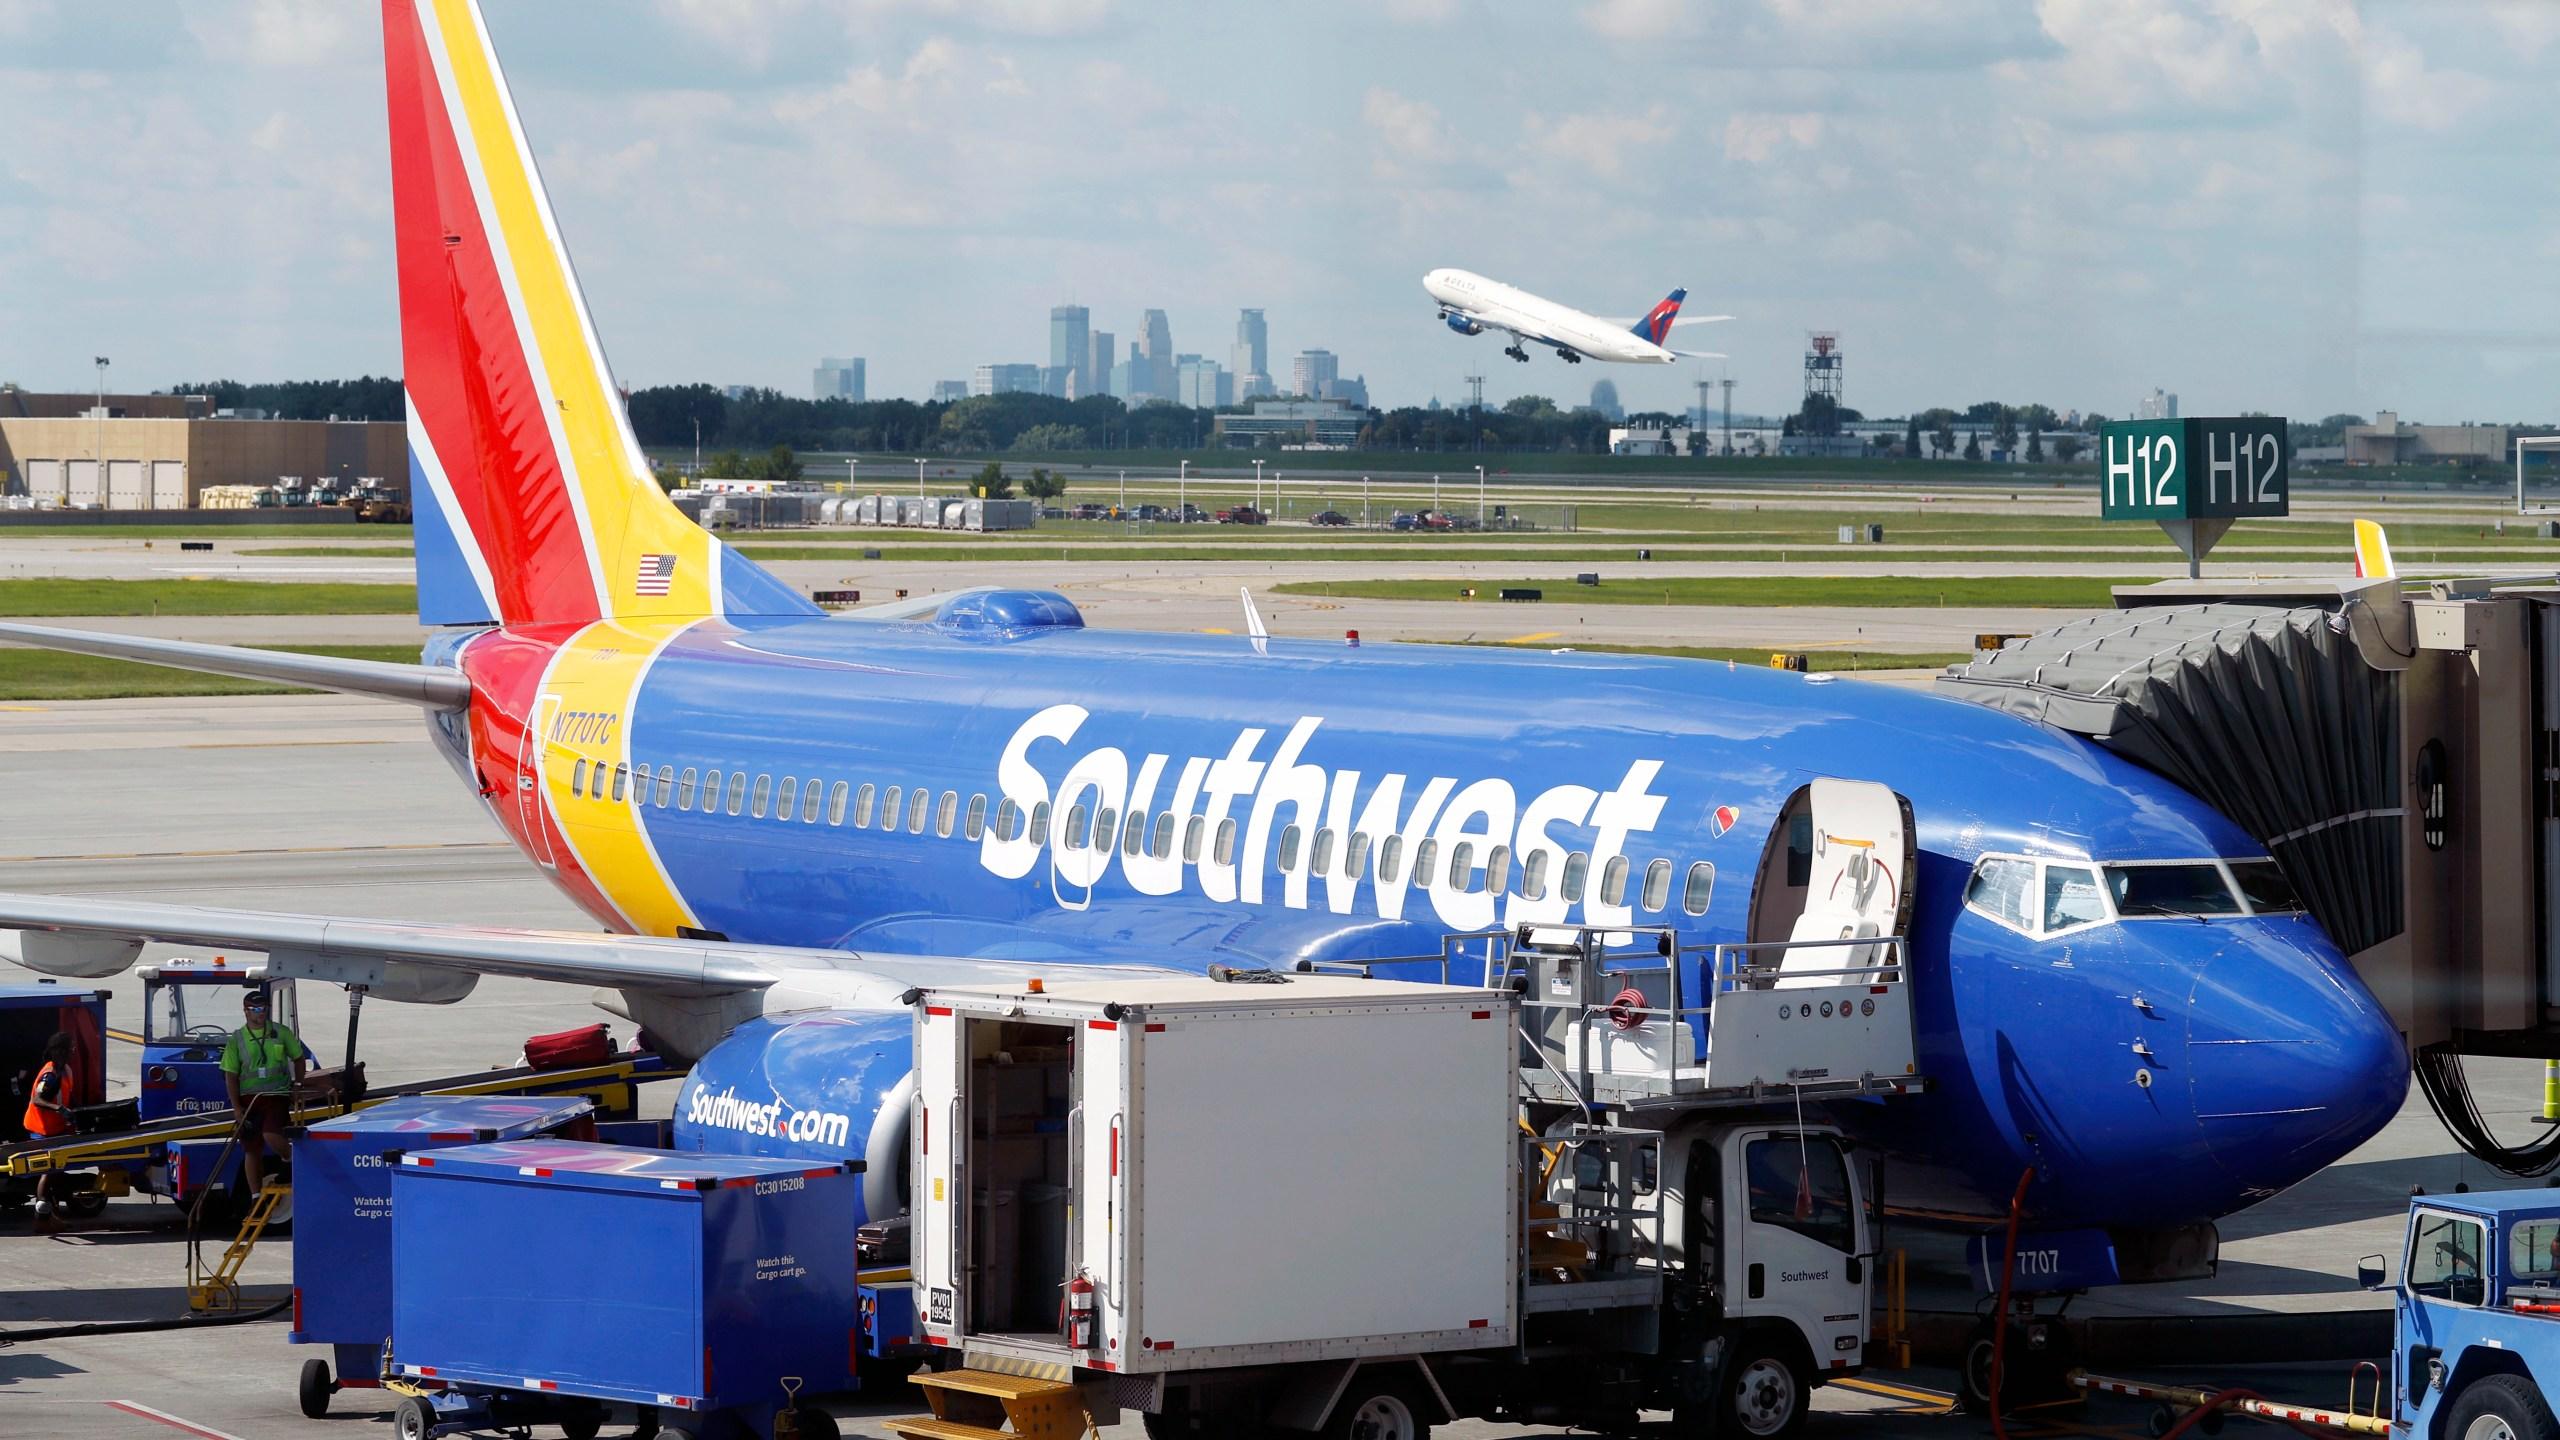 Earns_Southwest_Airlines_17471-159532.jpg91421433